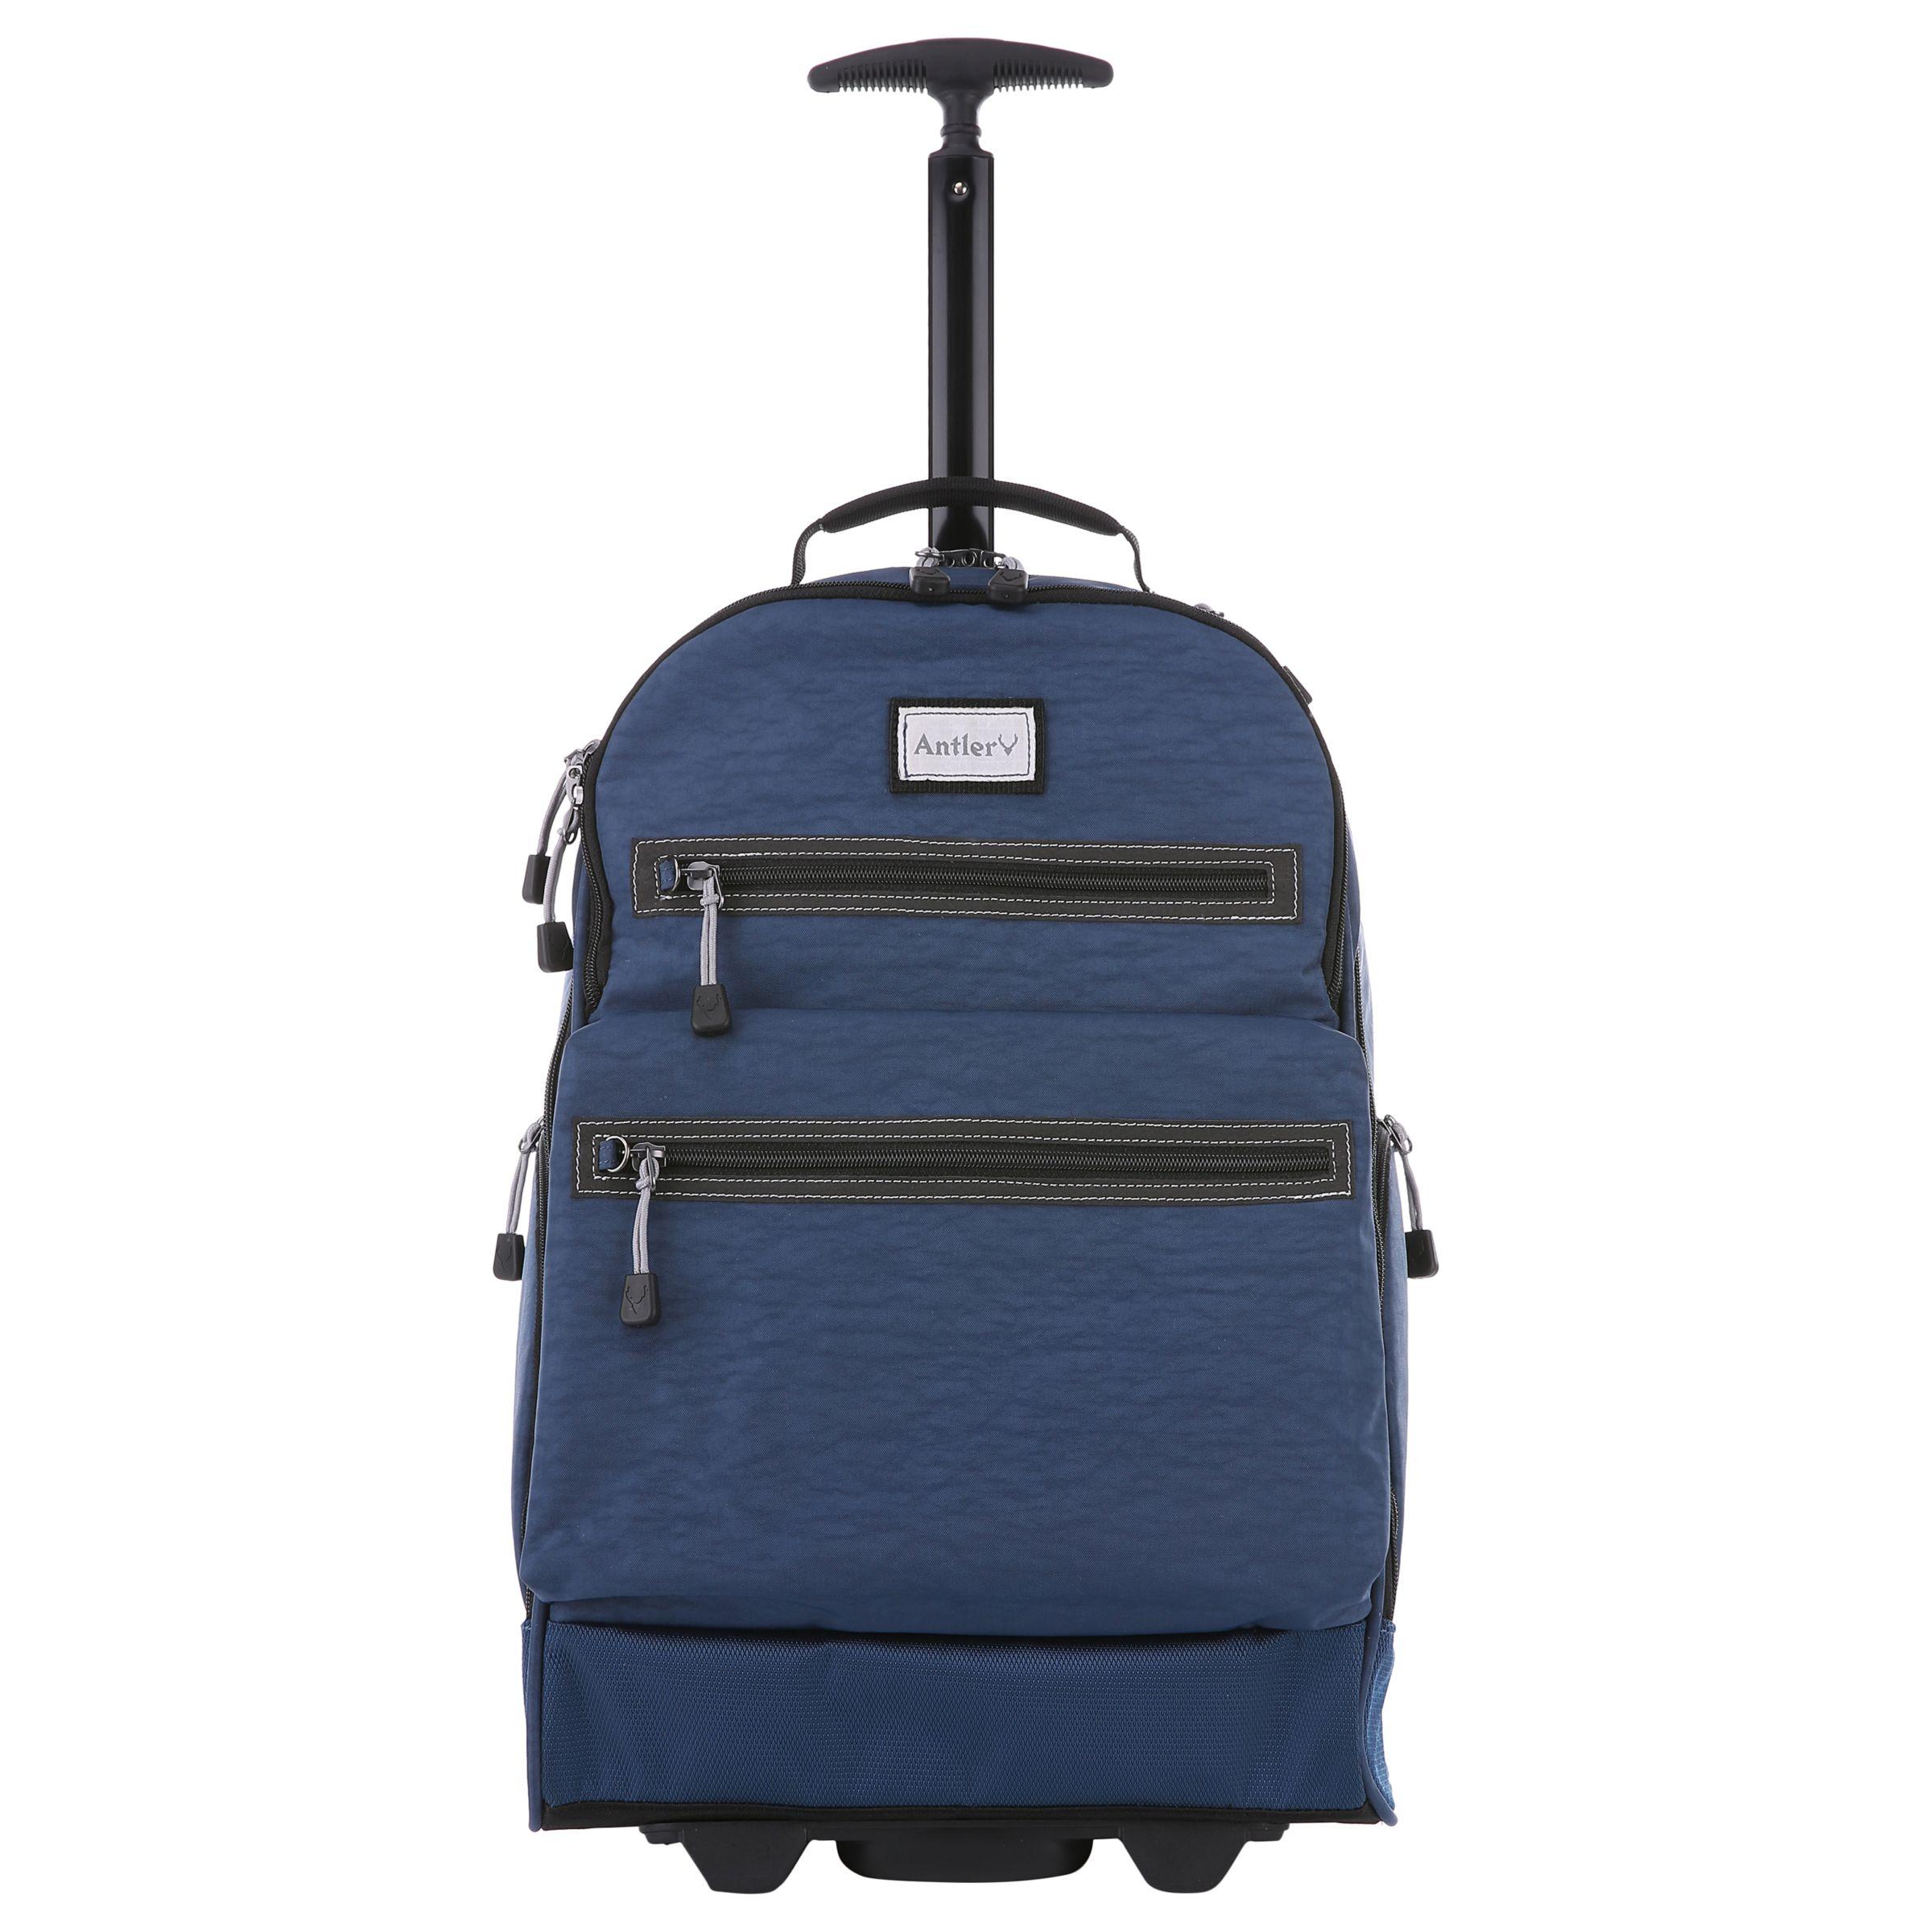 Antler Antler Urbanite Evolve Trolley Backpack